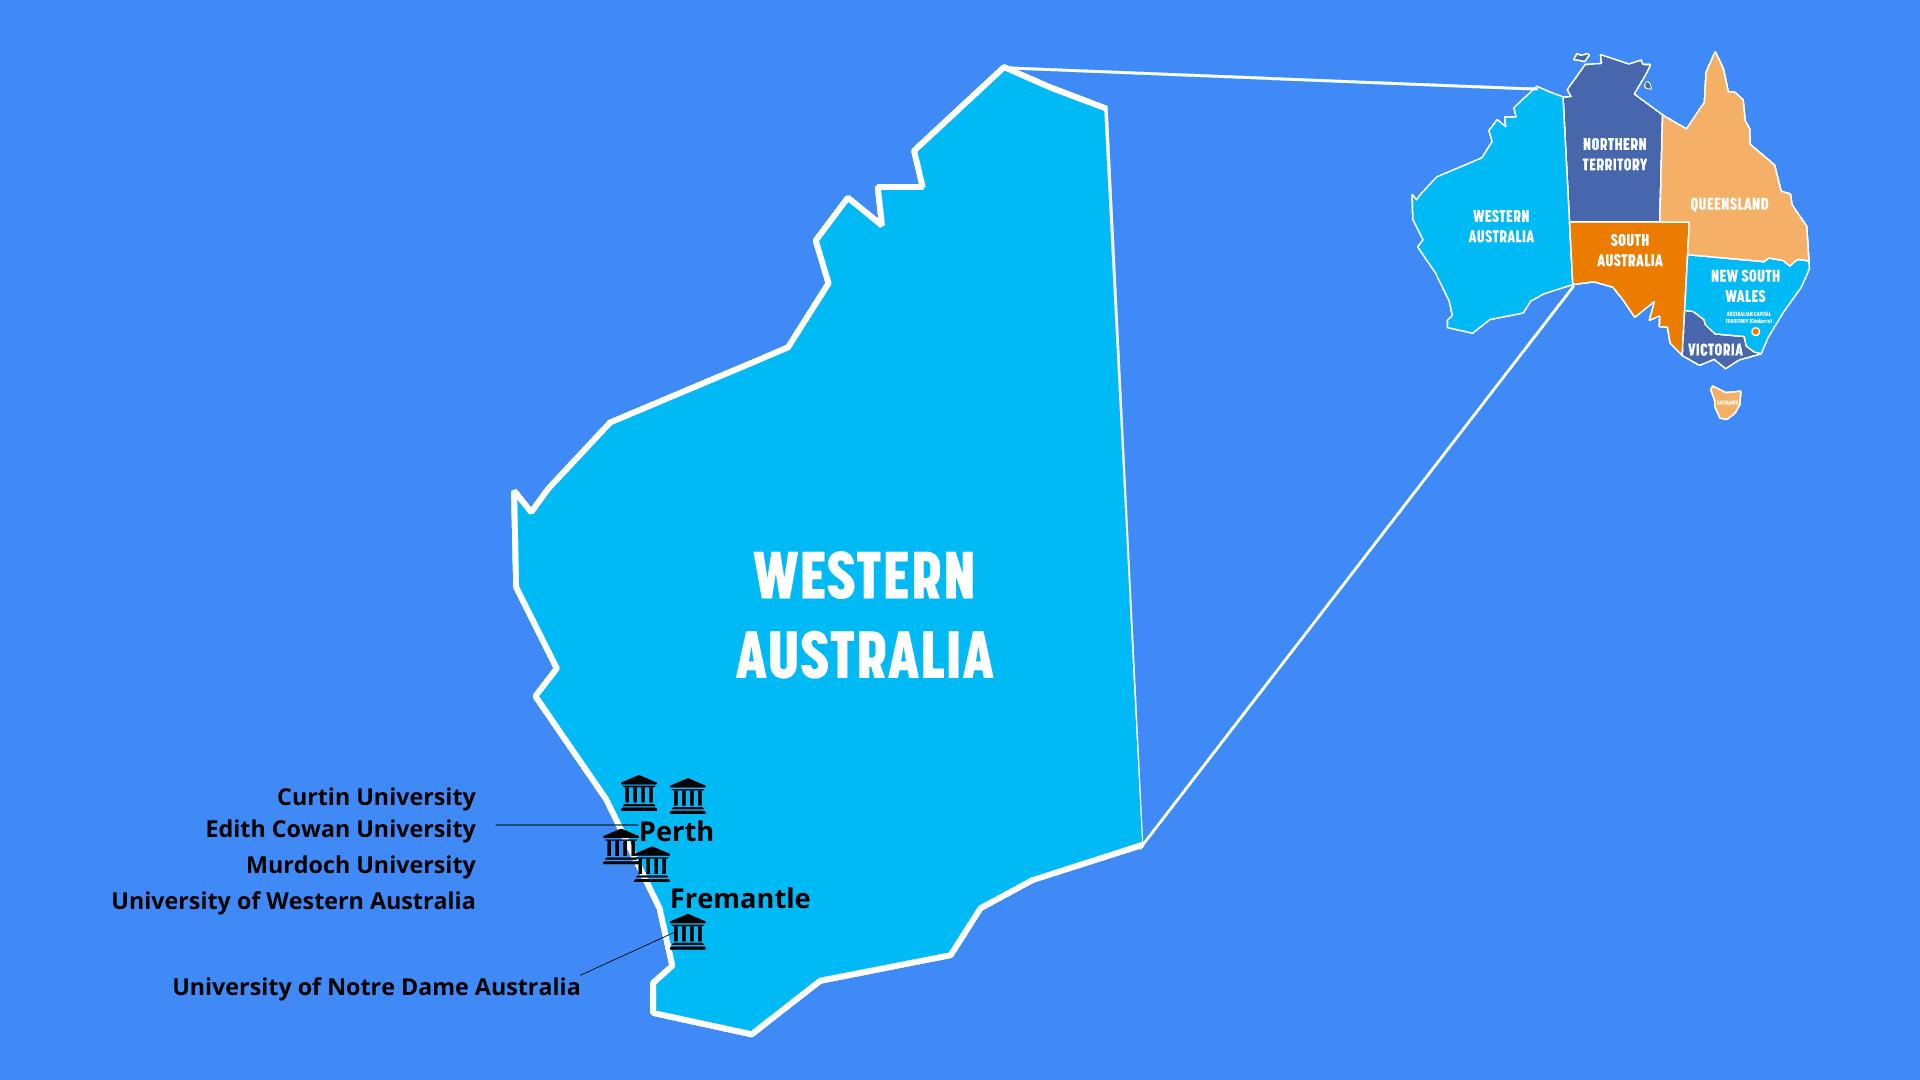 Universities in Western Australia Map